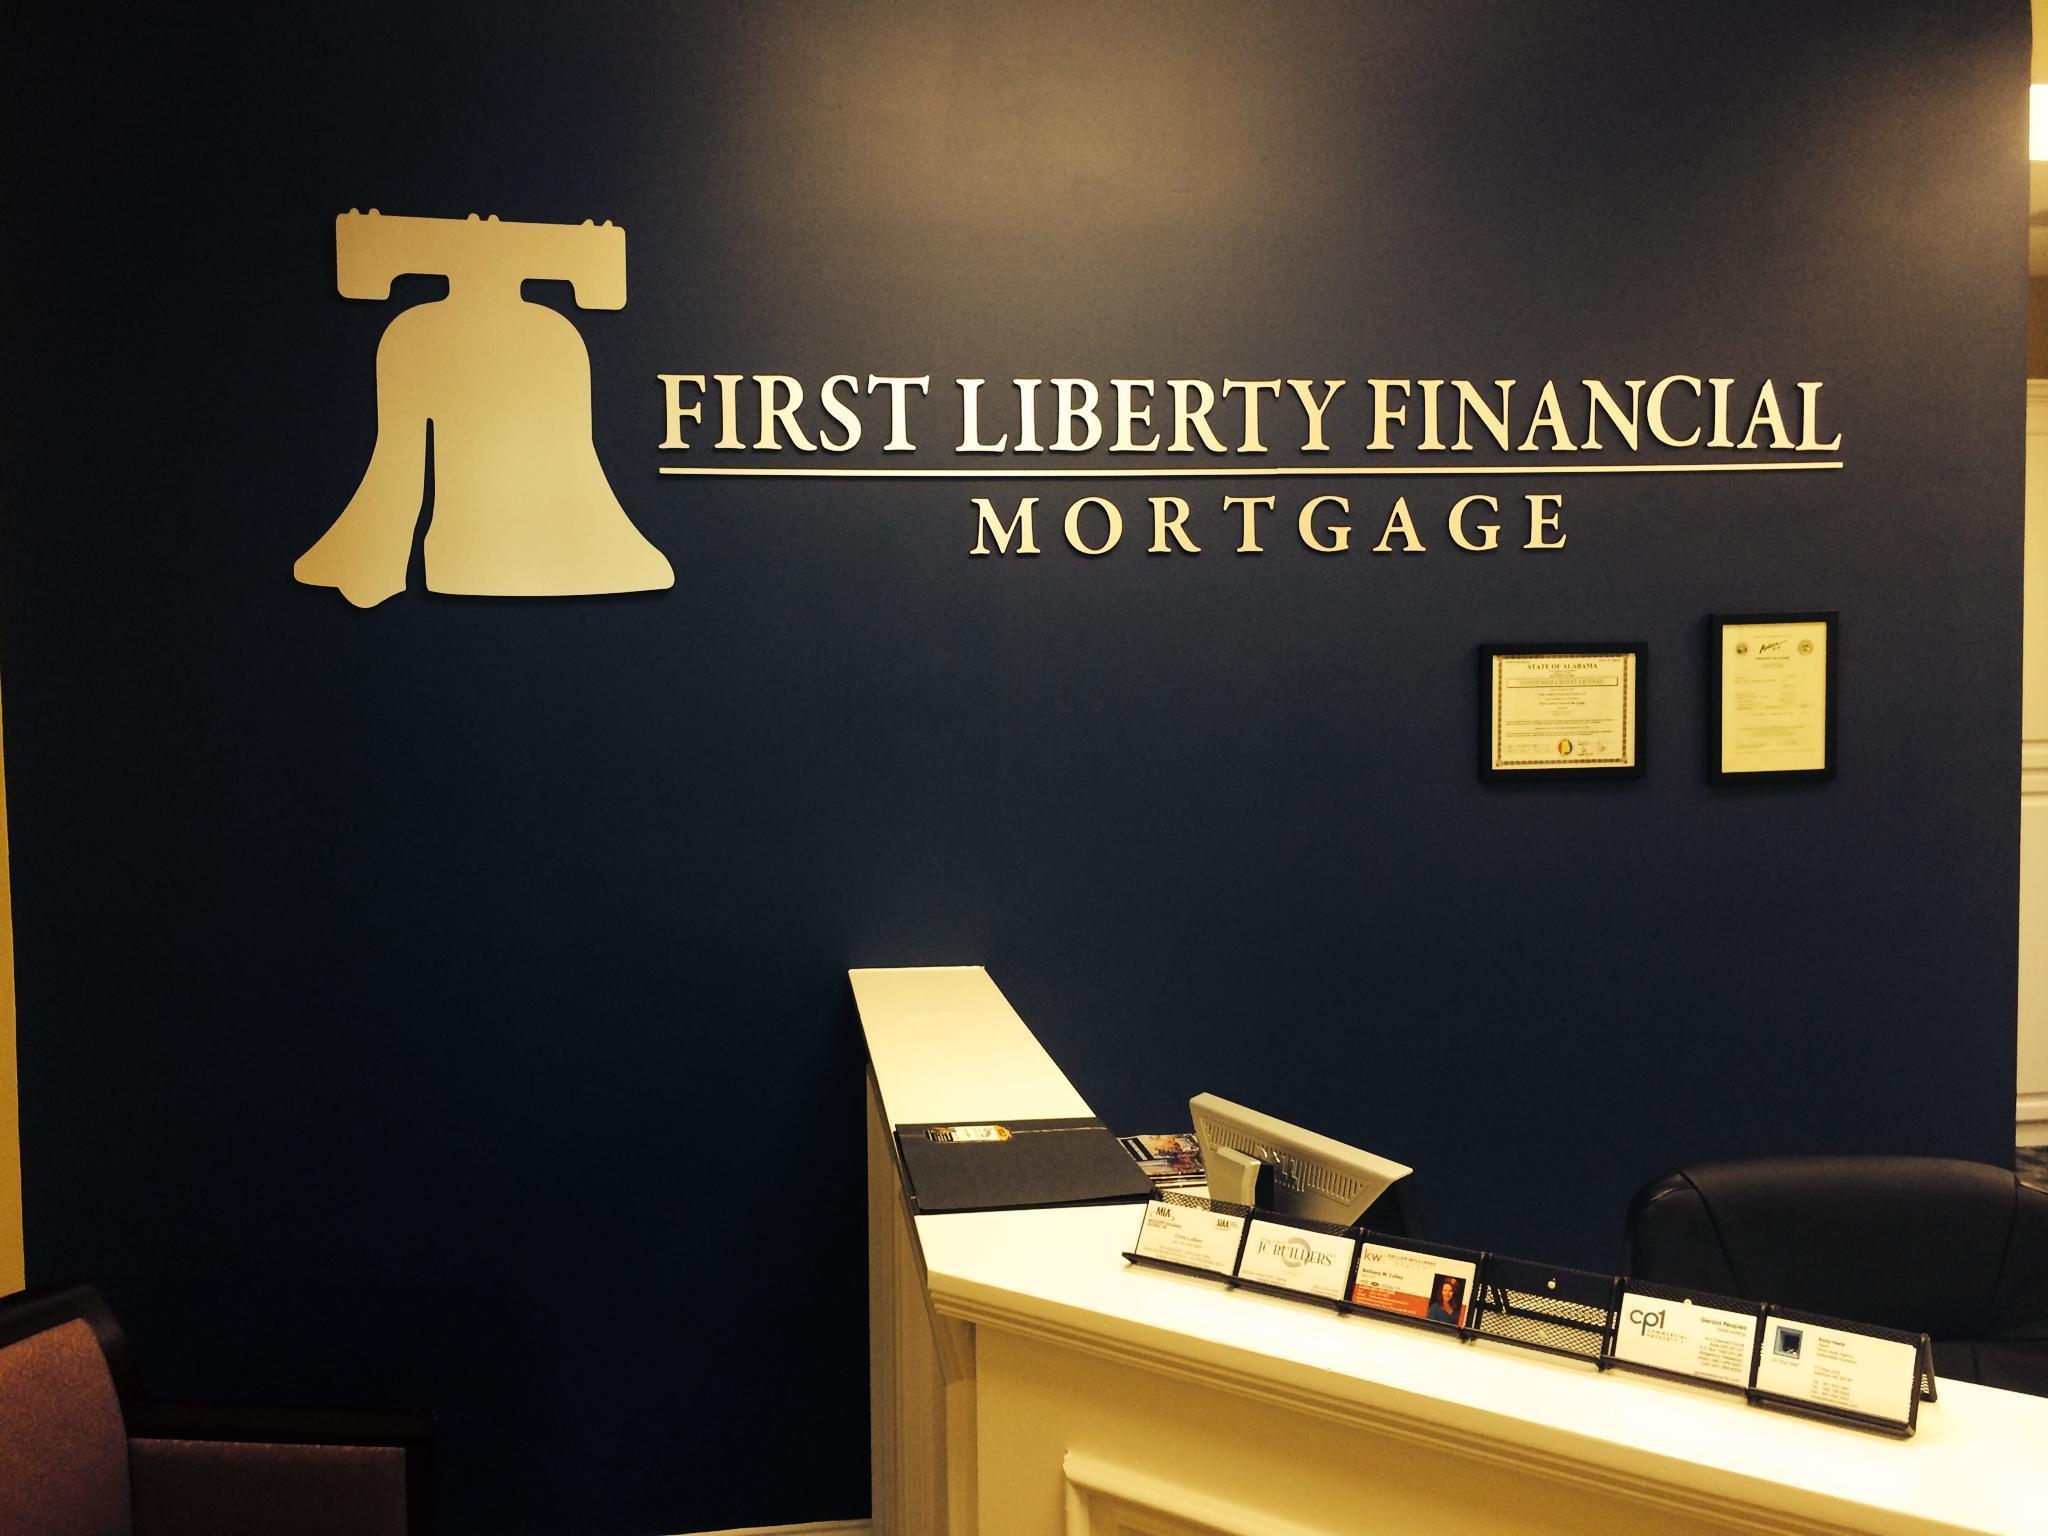 Cash loans in broadview il image 8